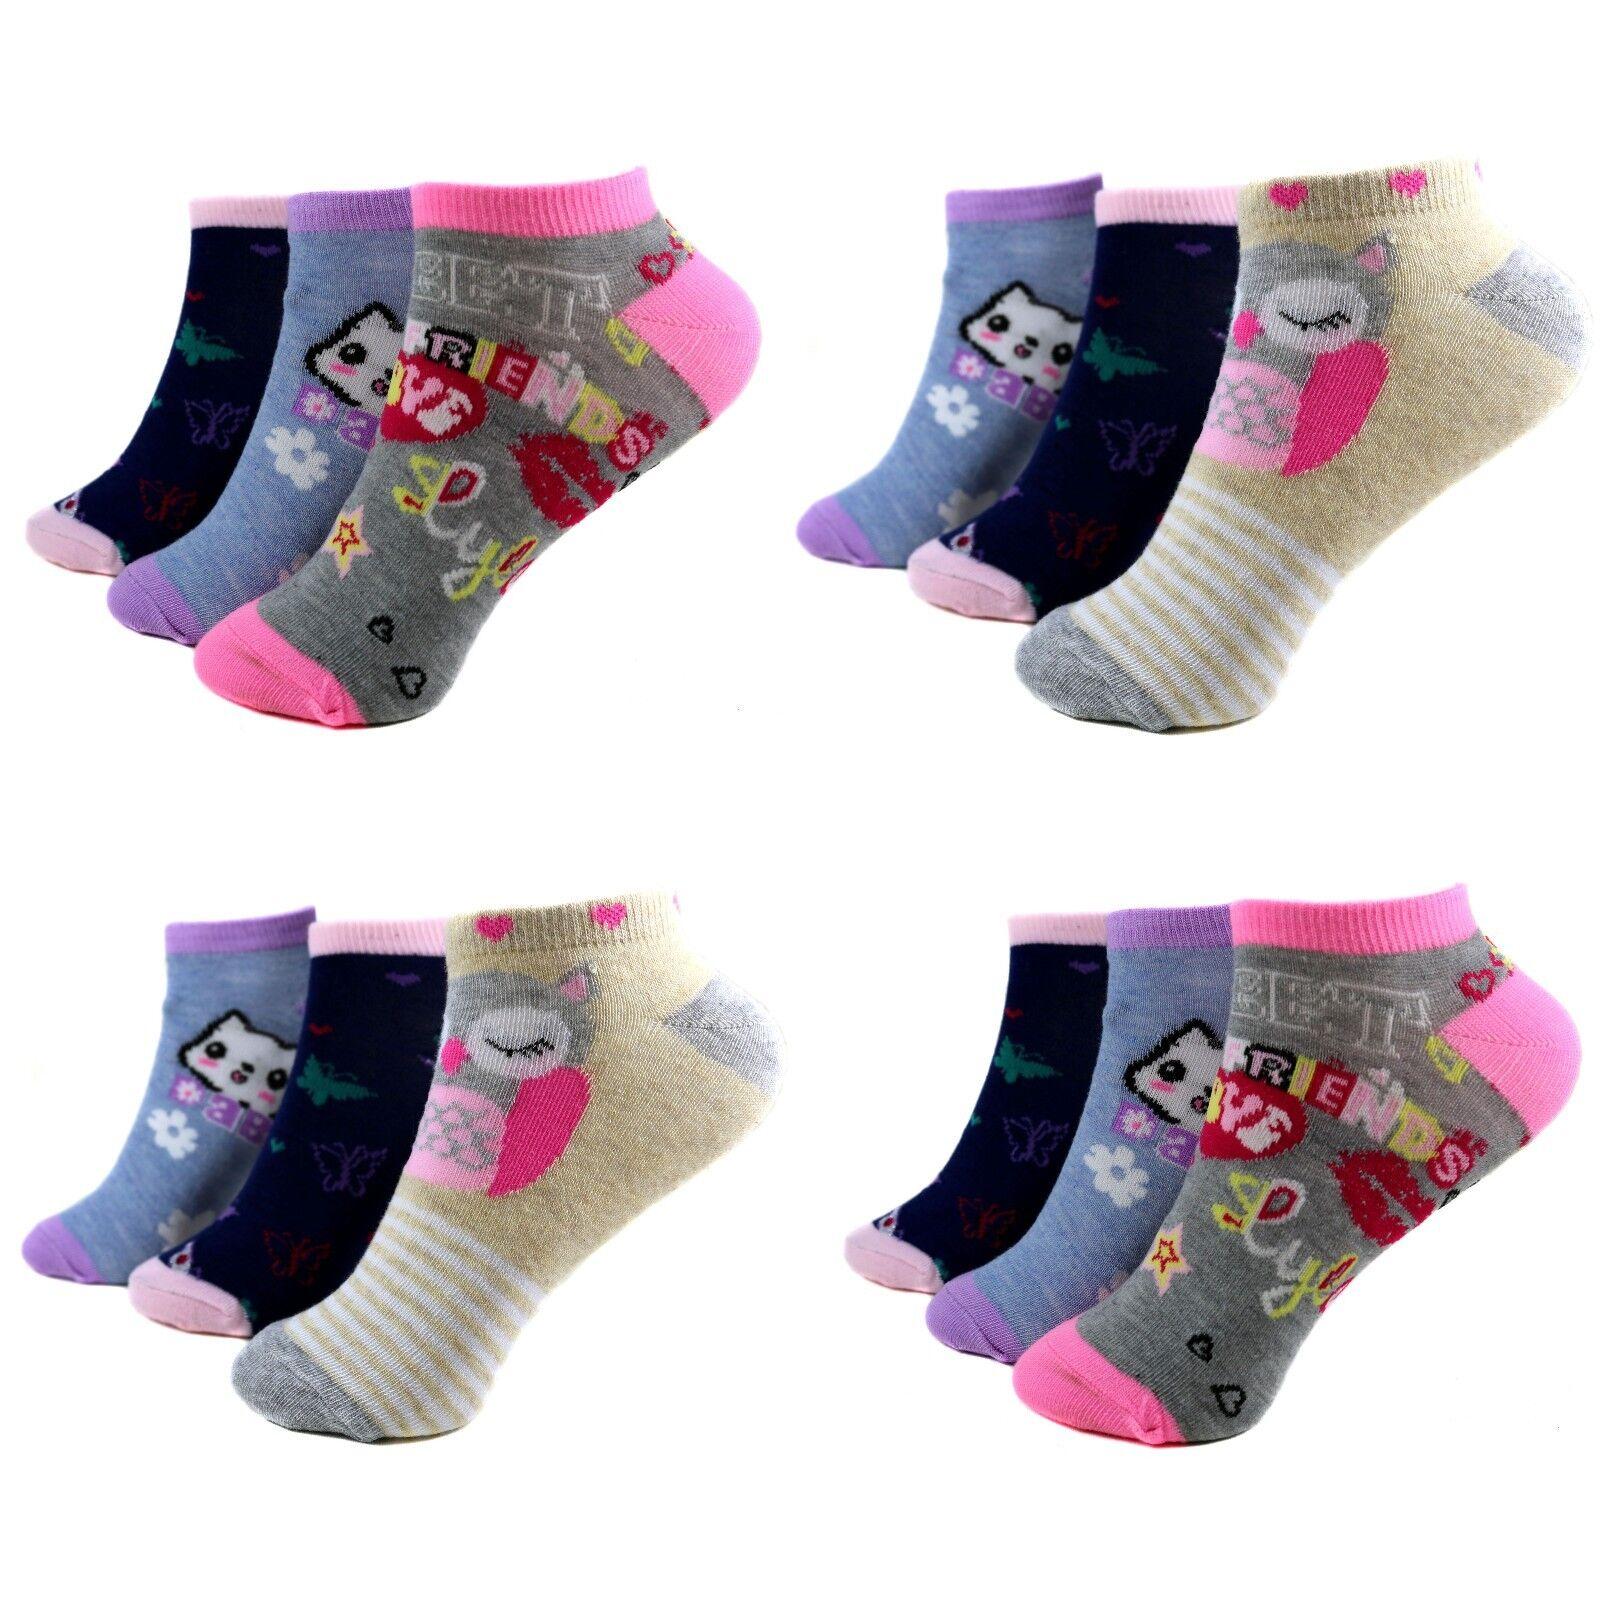 89186e8102 12 Paar Kids Mädchen Socken Kinder Sneaker Strümpfe 95% Baumwolle Gr ...